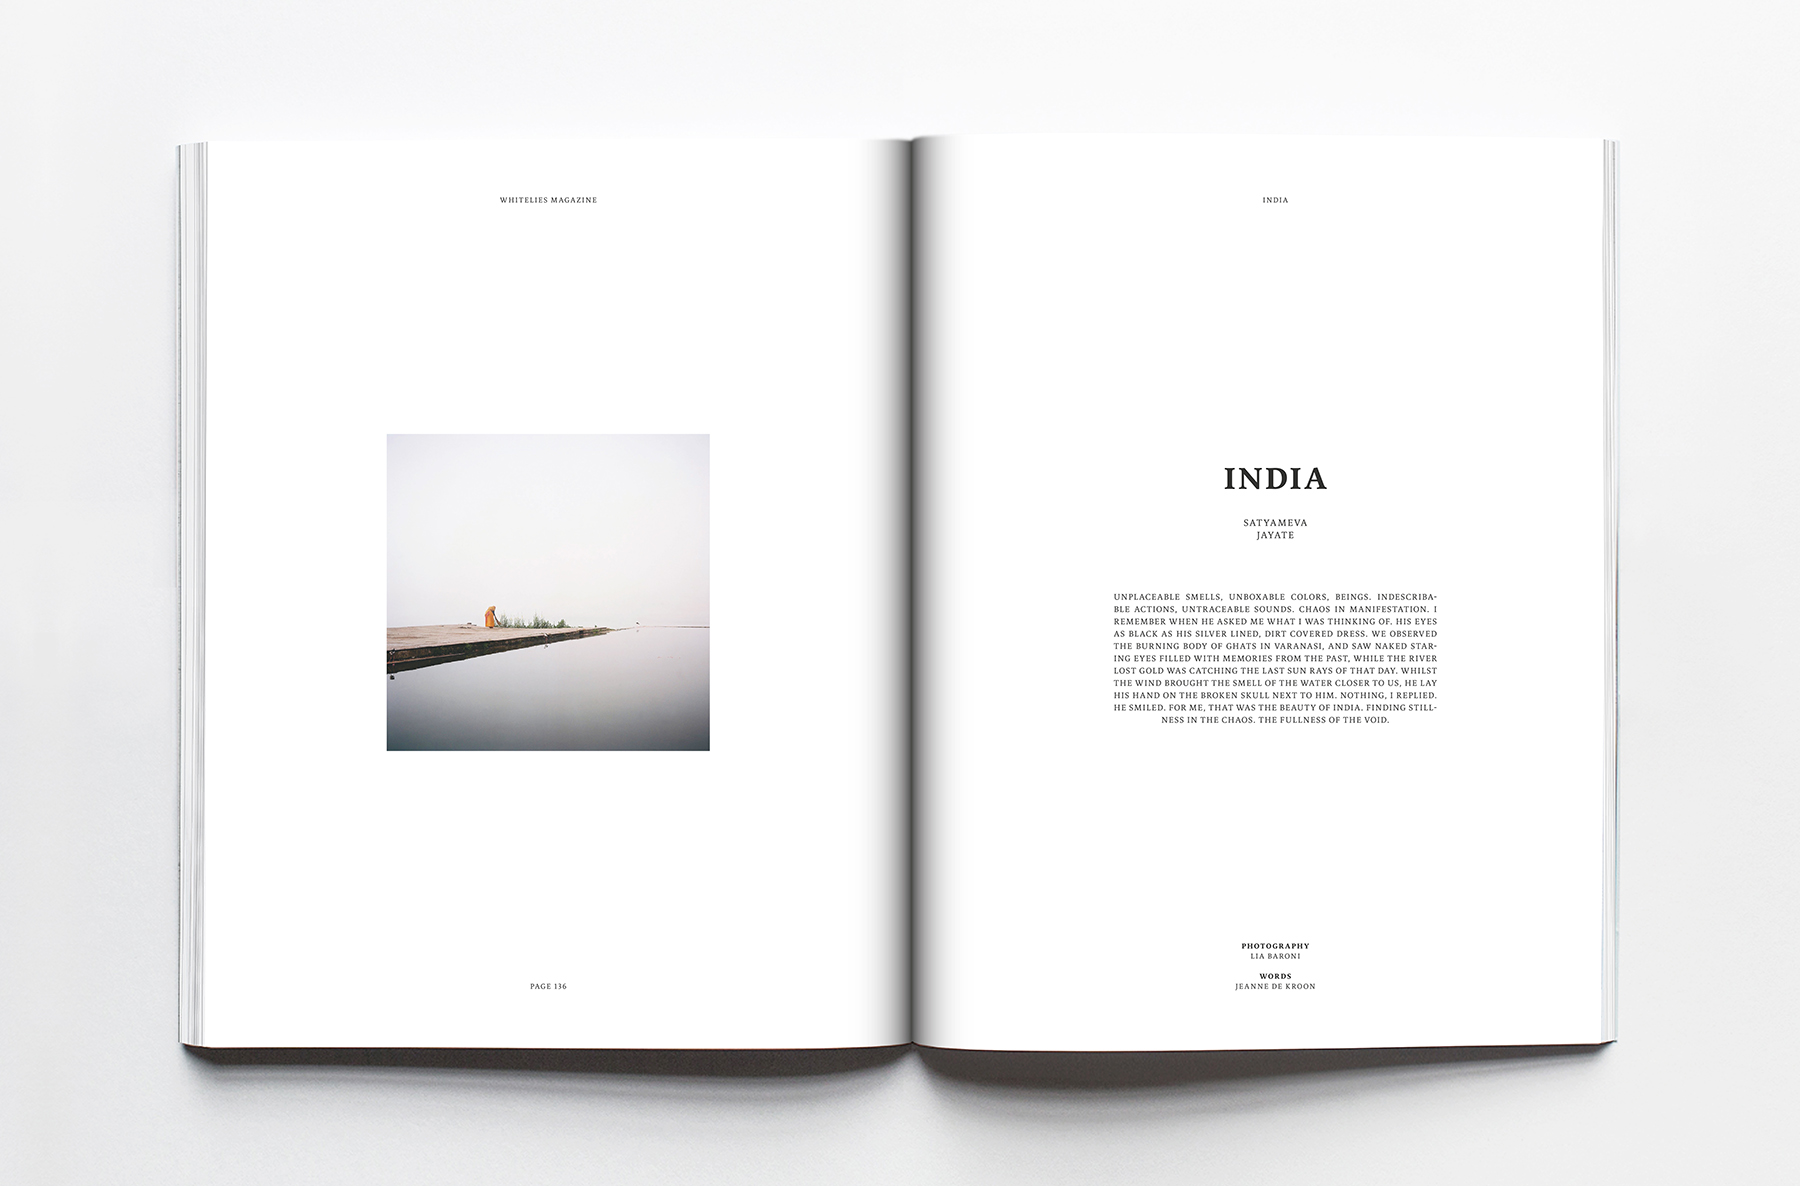 wla_magazine_36.jpg